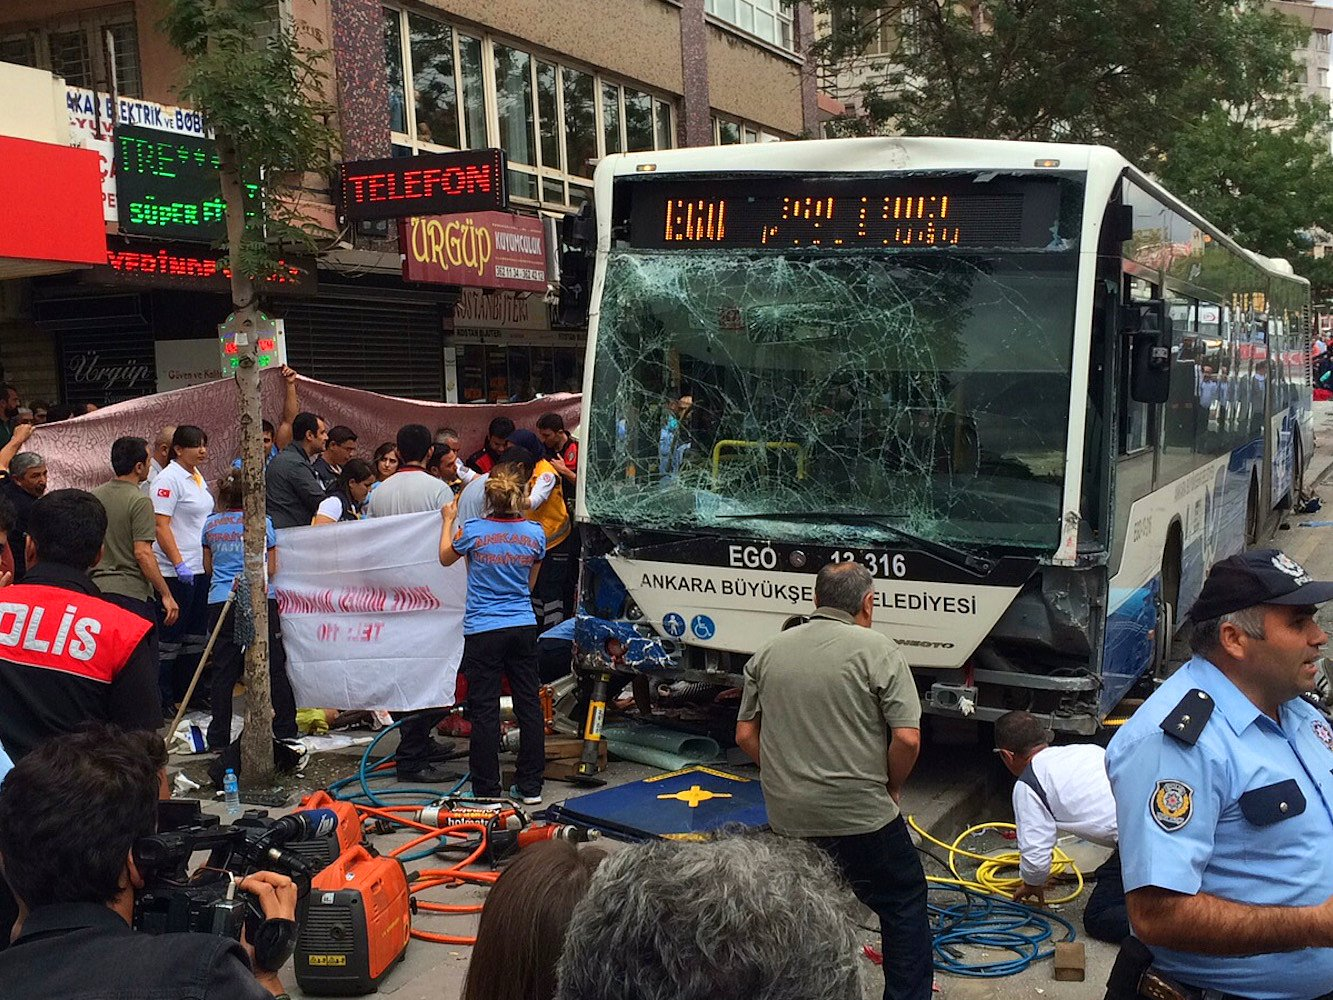 Ankara'daki otobüs katliamında iddianame hazırlandı